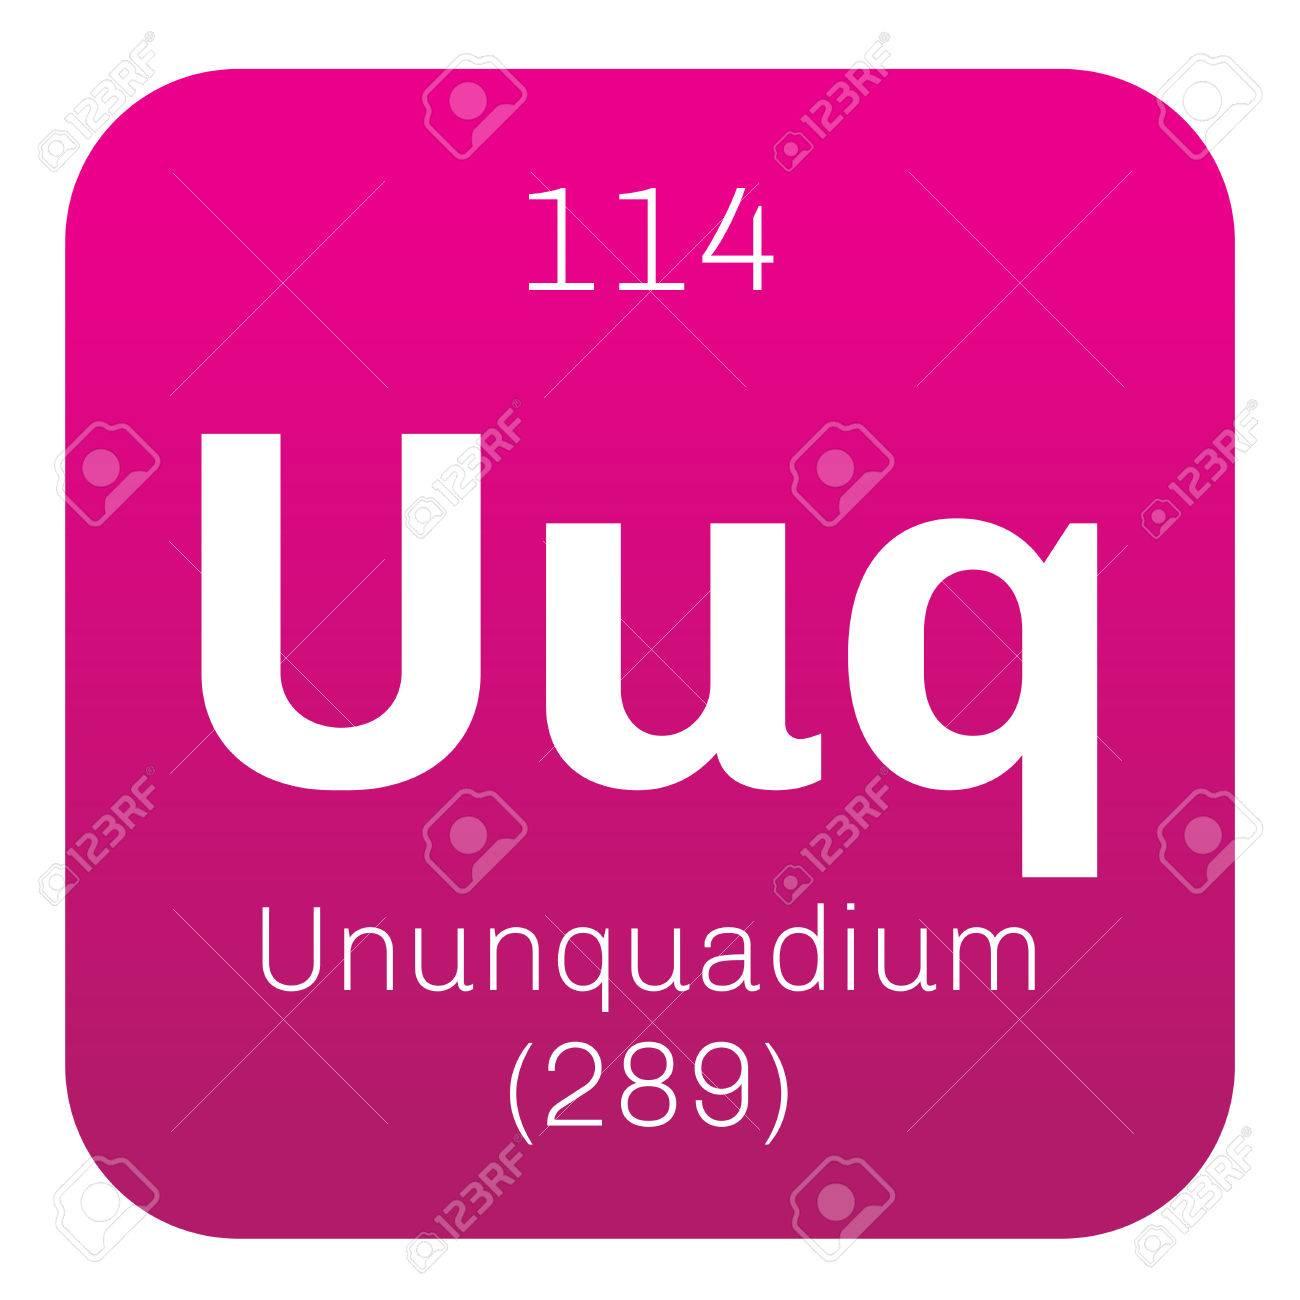 Ununquadium chemical element science symbol chemistry colored ununquadium chemical element science symbol chemistry colored icon with atomic number and atomic weight urtaz Image collections